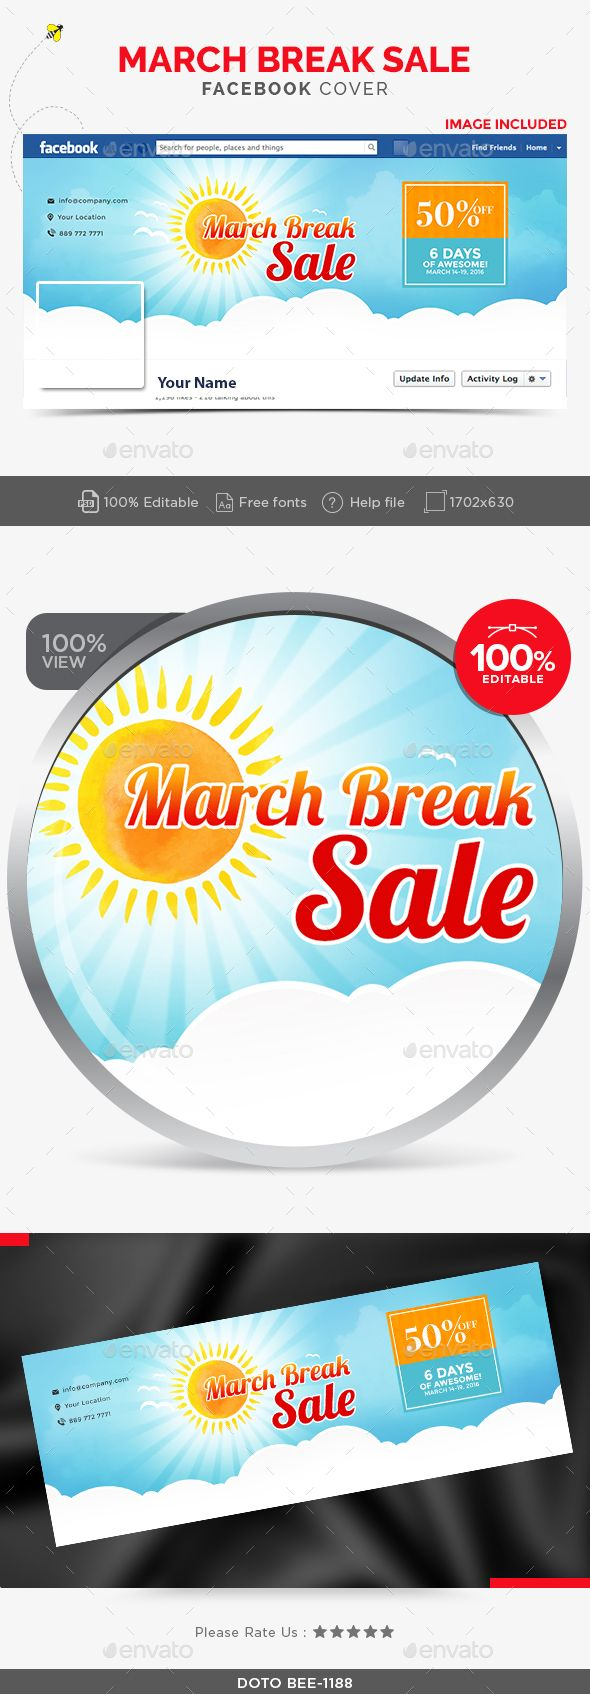 March Break Sale Facebook Cover - Facebook Timeline Covers Social Media   Download http://graphicriver.net/item/march-break-sale-facebook-cover/15174438?ref=sinzo